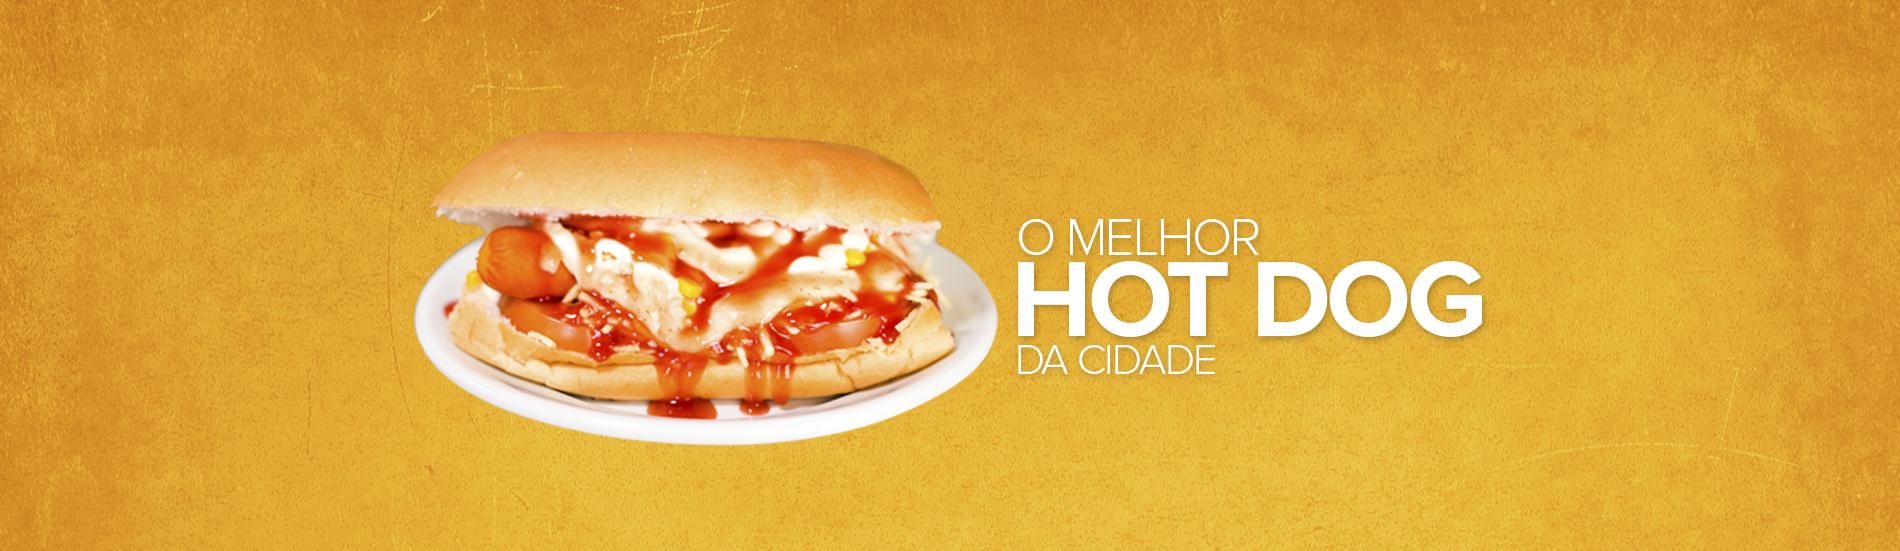 banner-hot-dog